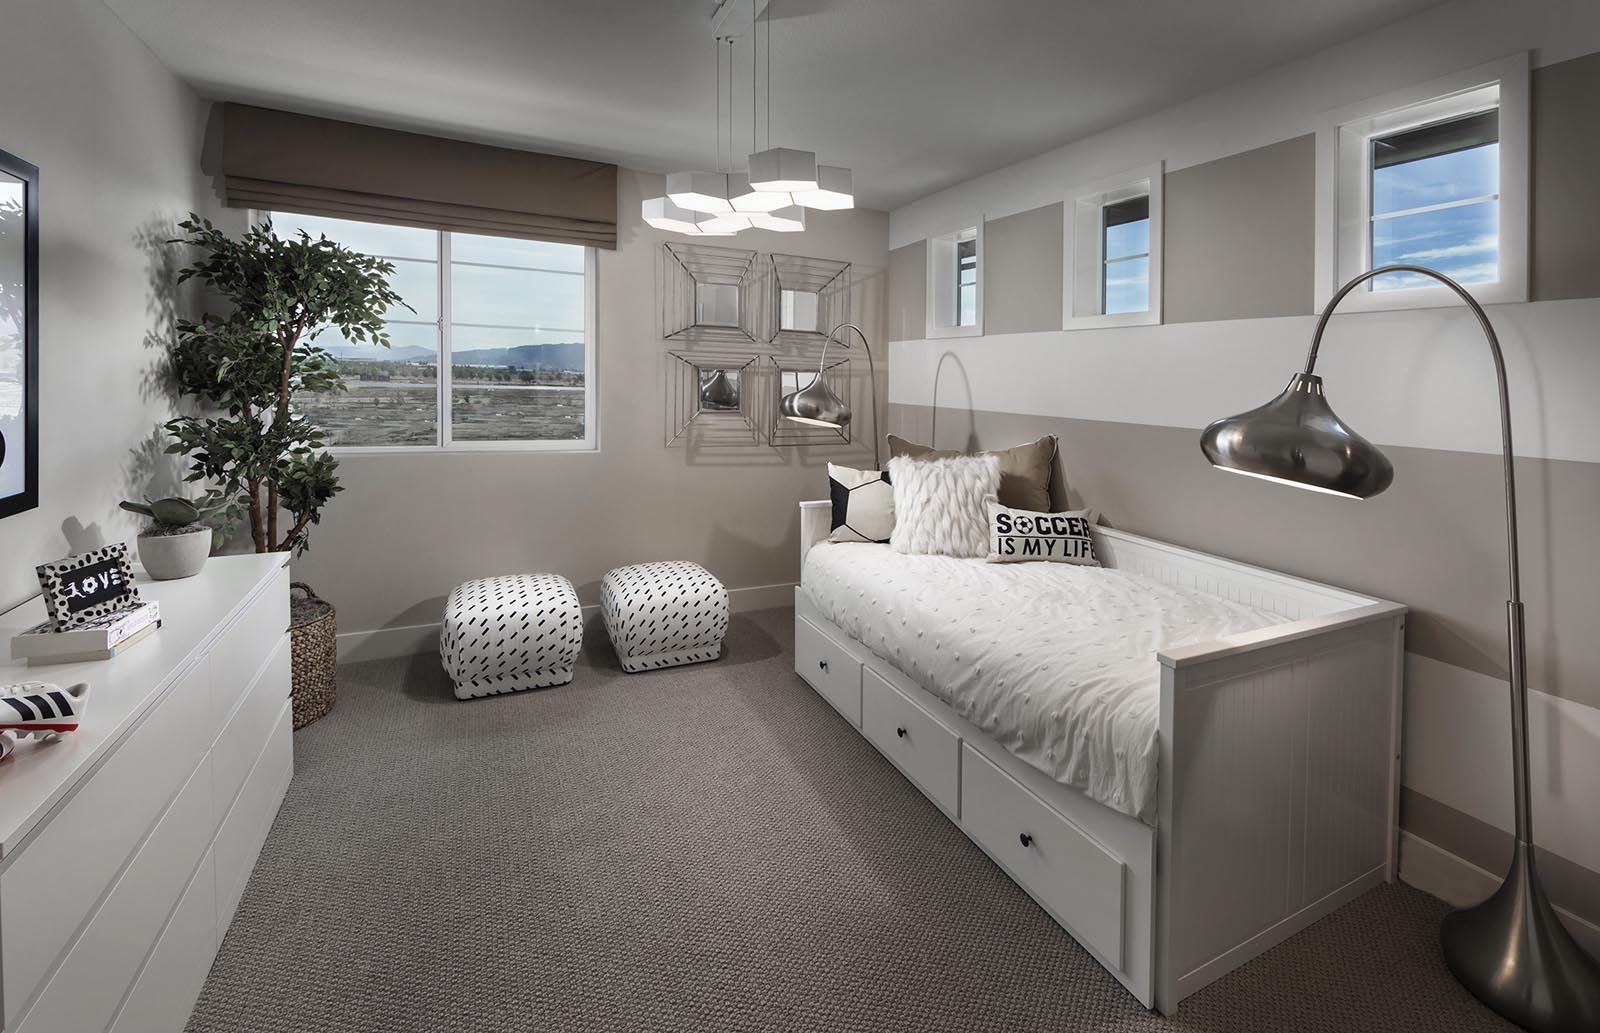 Bedroom 4 Residence 4 | Downing at Boulevard by Lennar, Dublin, CA